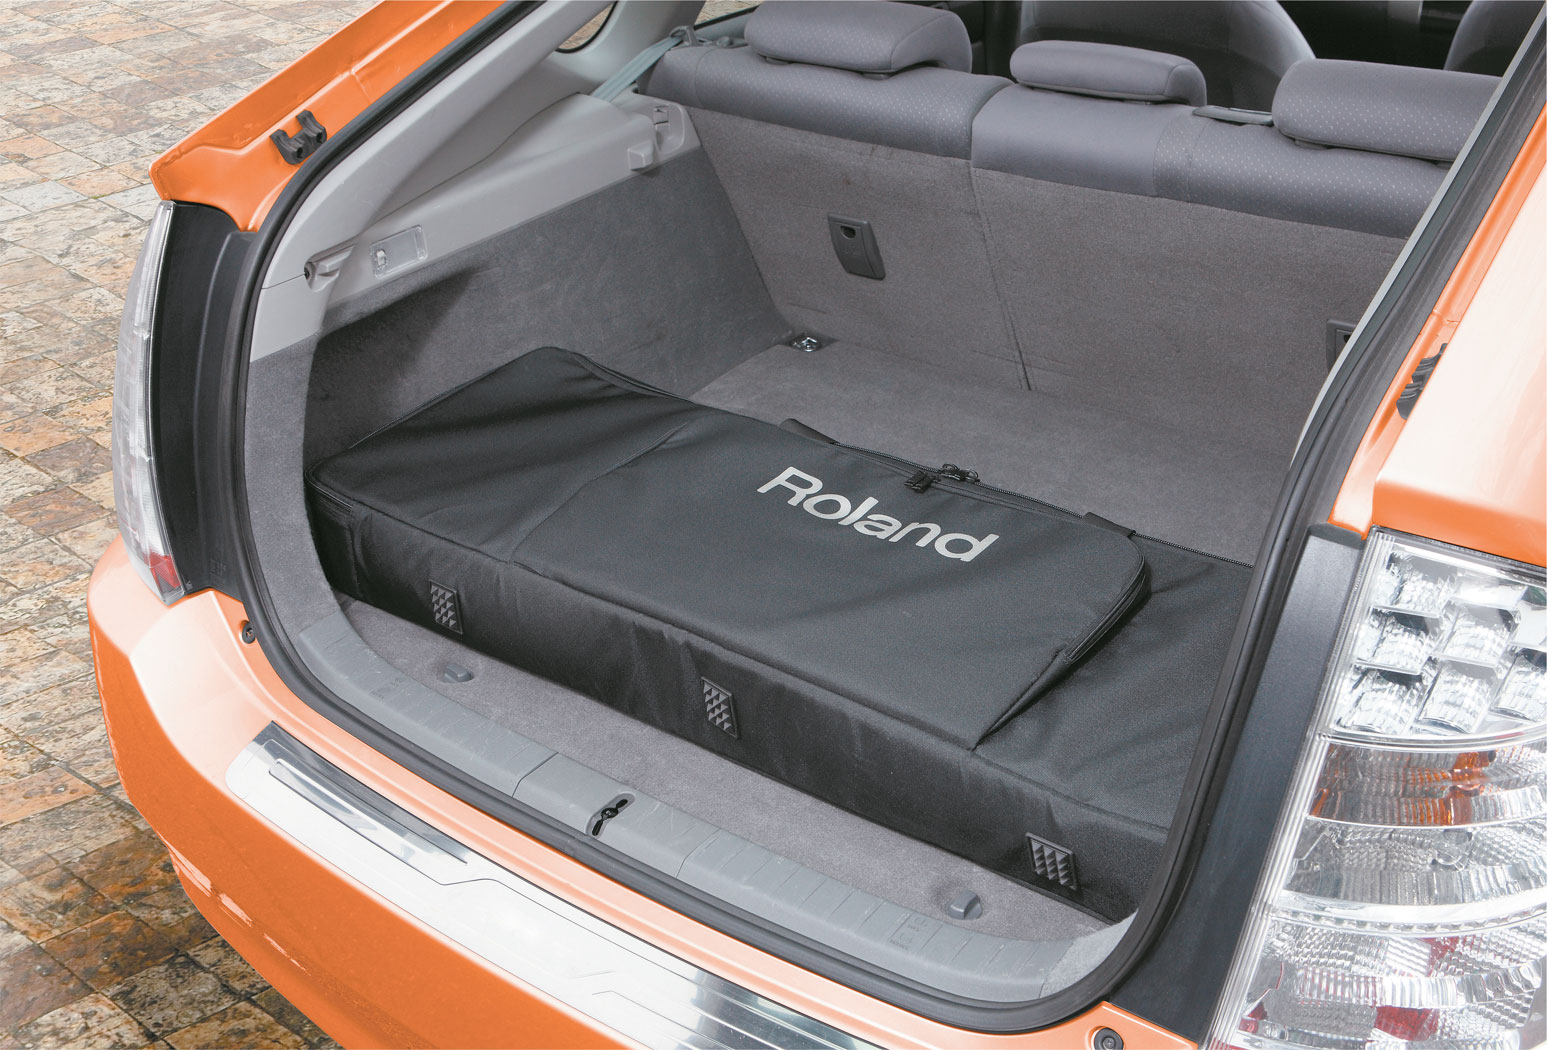 rd 64 trunk 2 gal - Roland Rd-64 Digital Piano